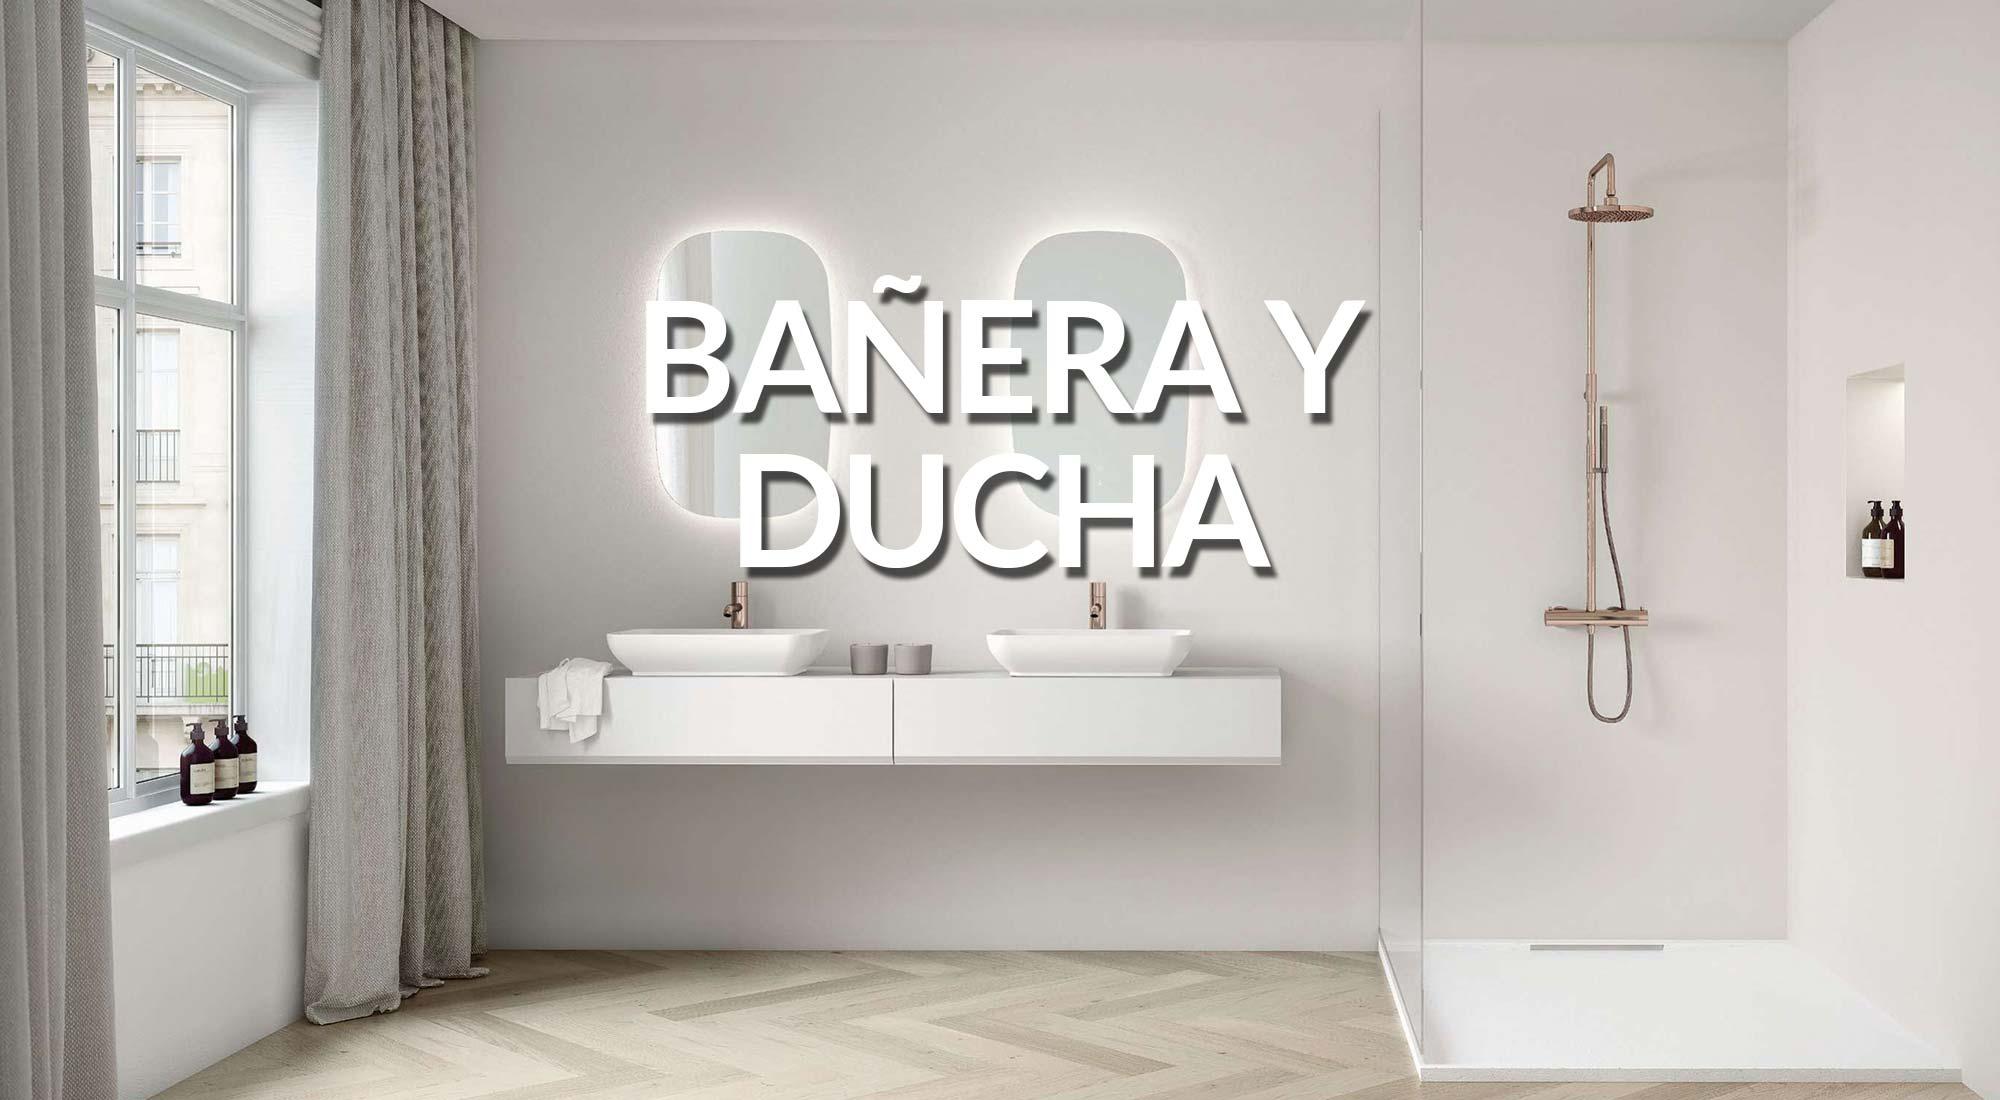 Bañera y ducha 3